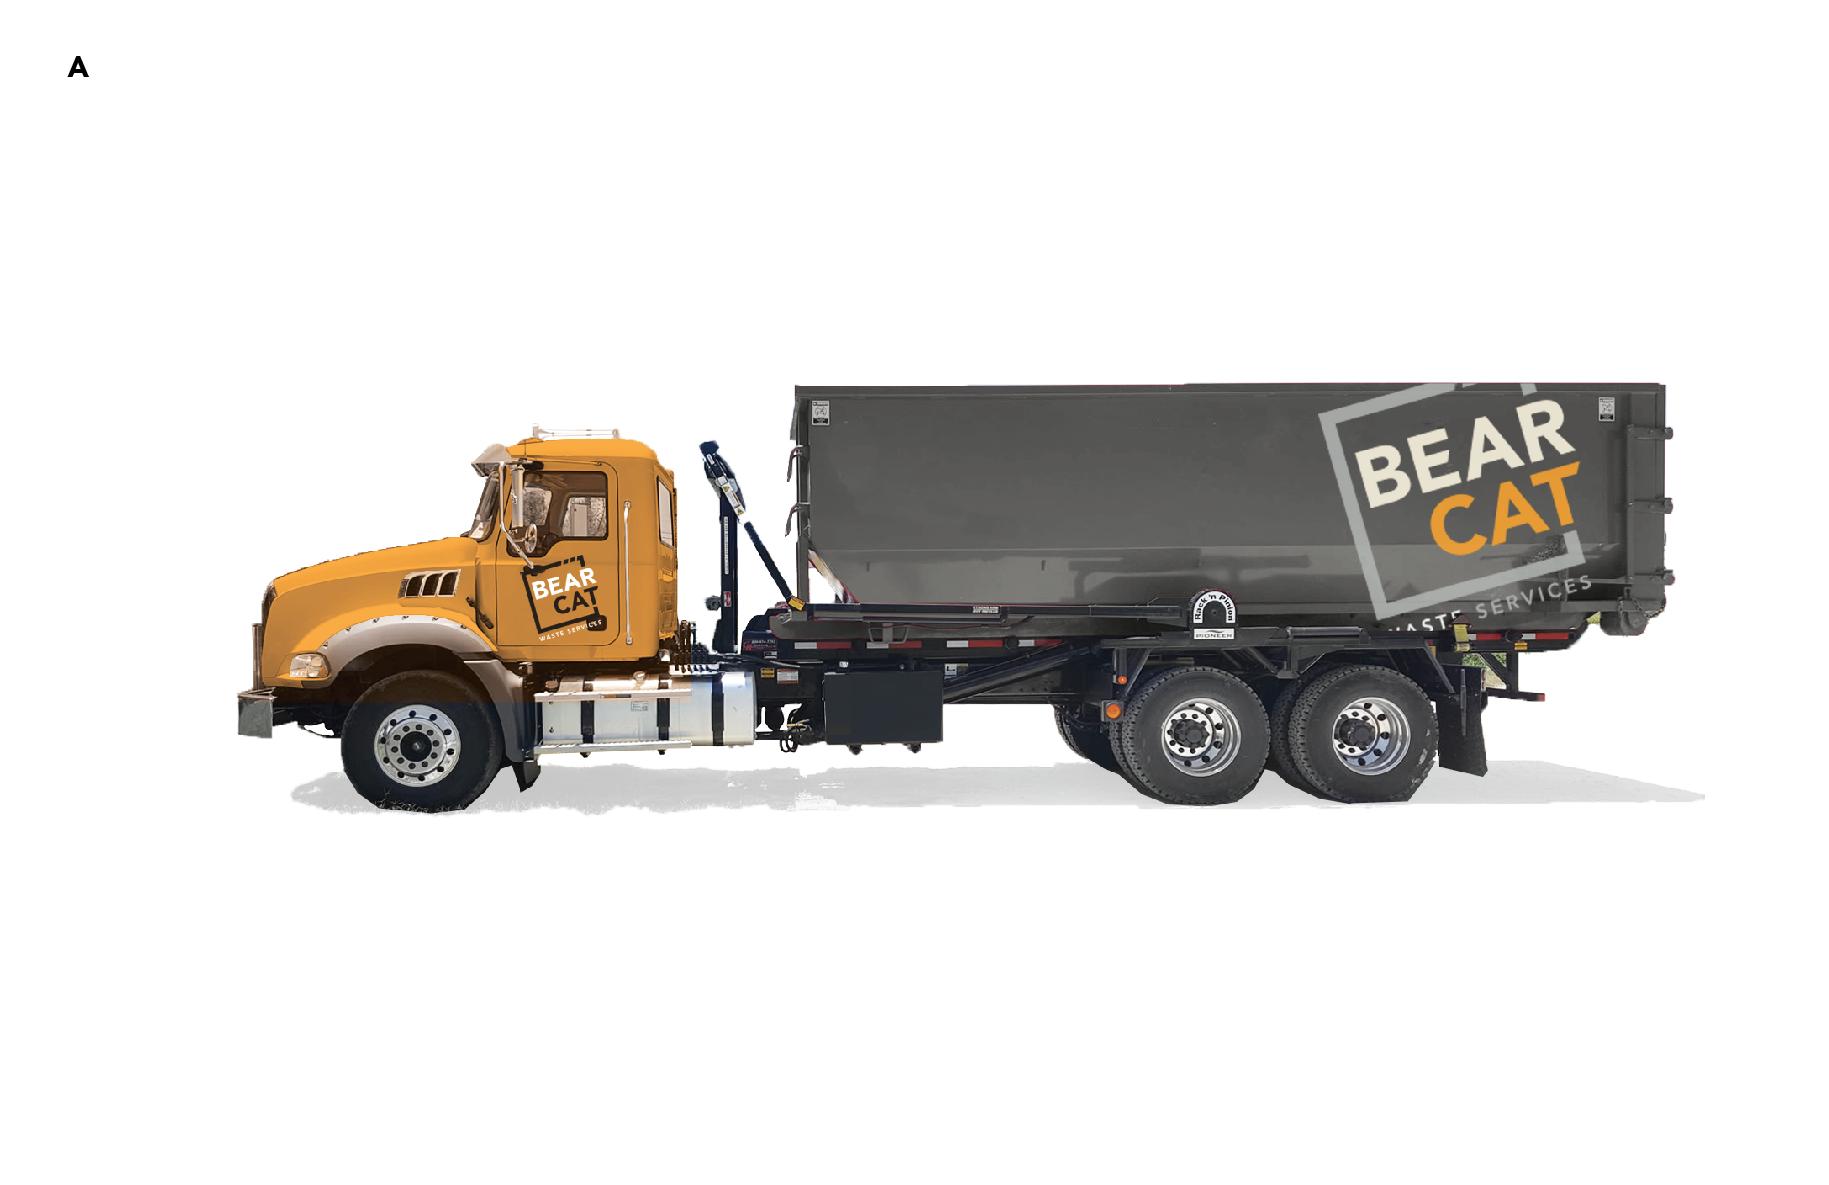 Bearcat-logo-presentation-layout-A-round1-truck.png